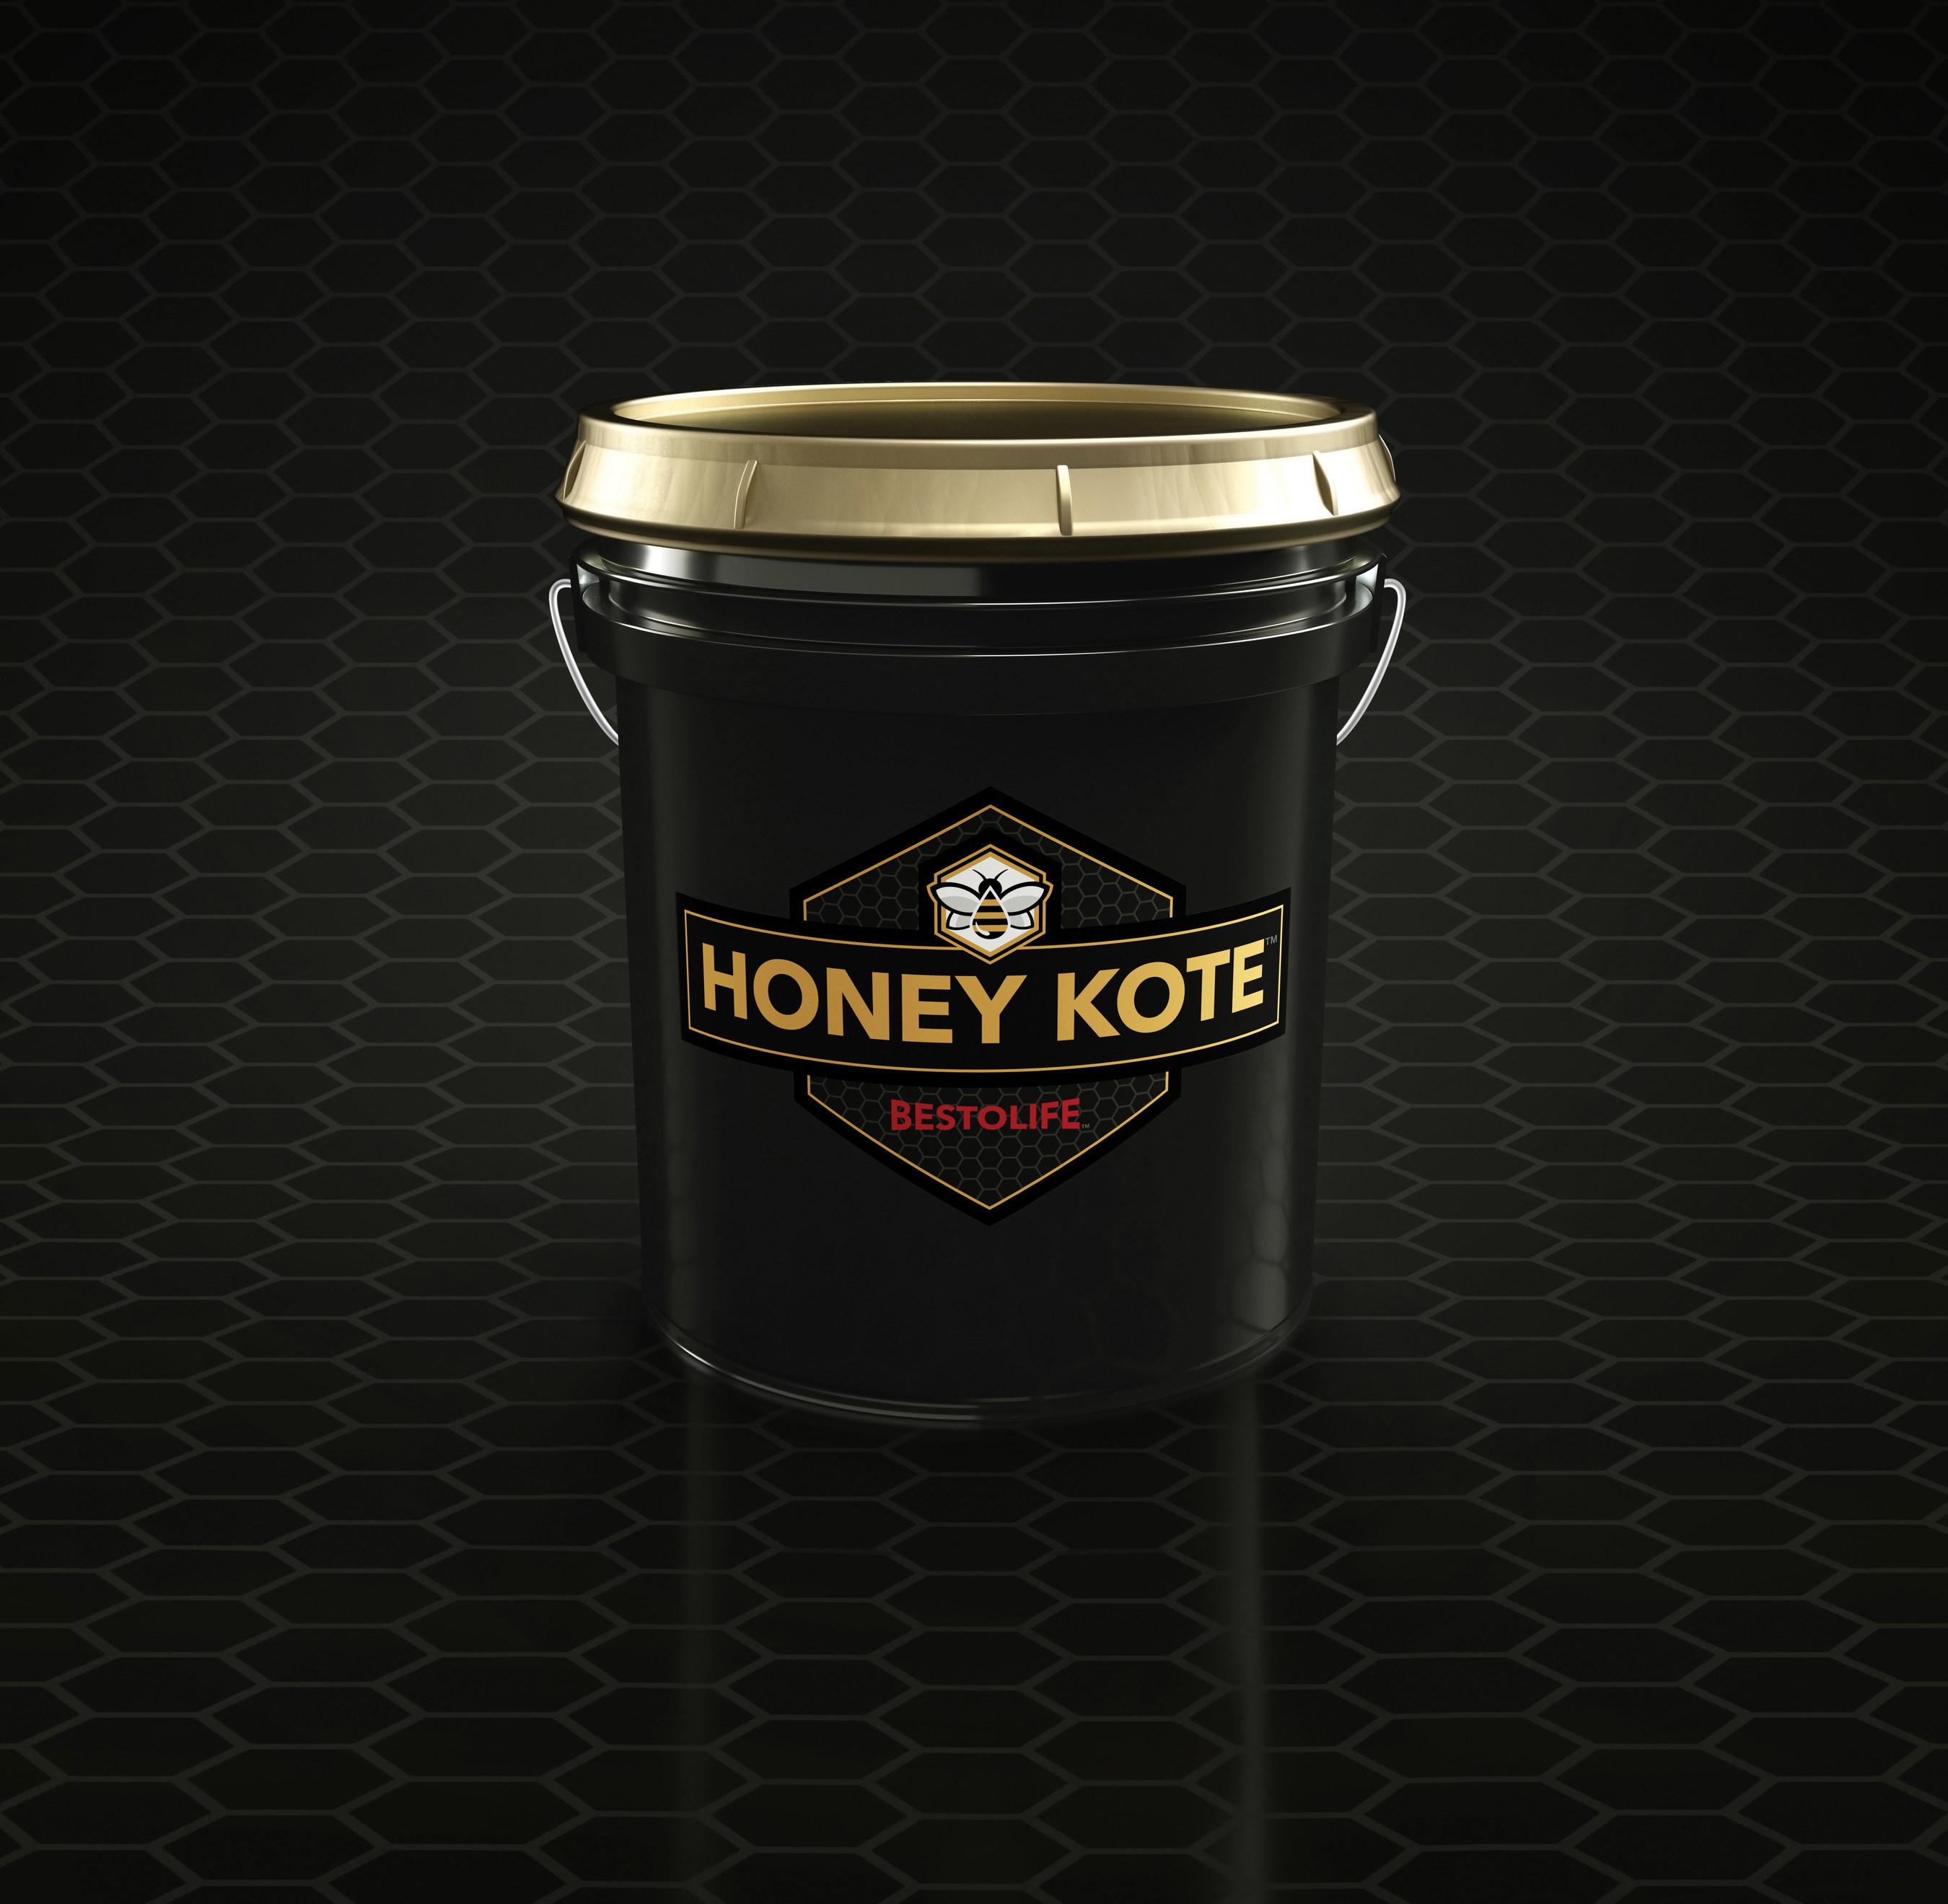 New HONEY KOTE(TM) copper-based drilling compound.